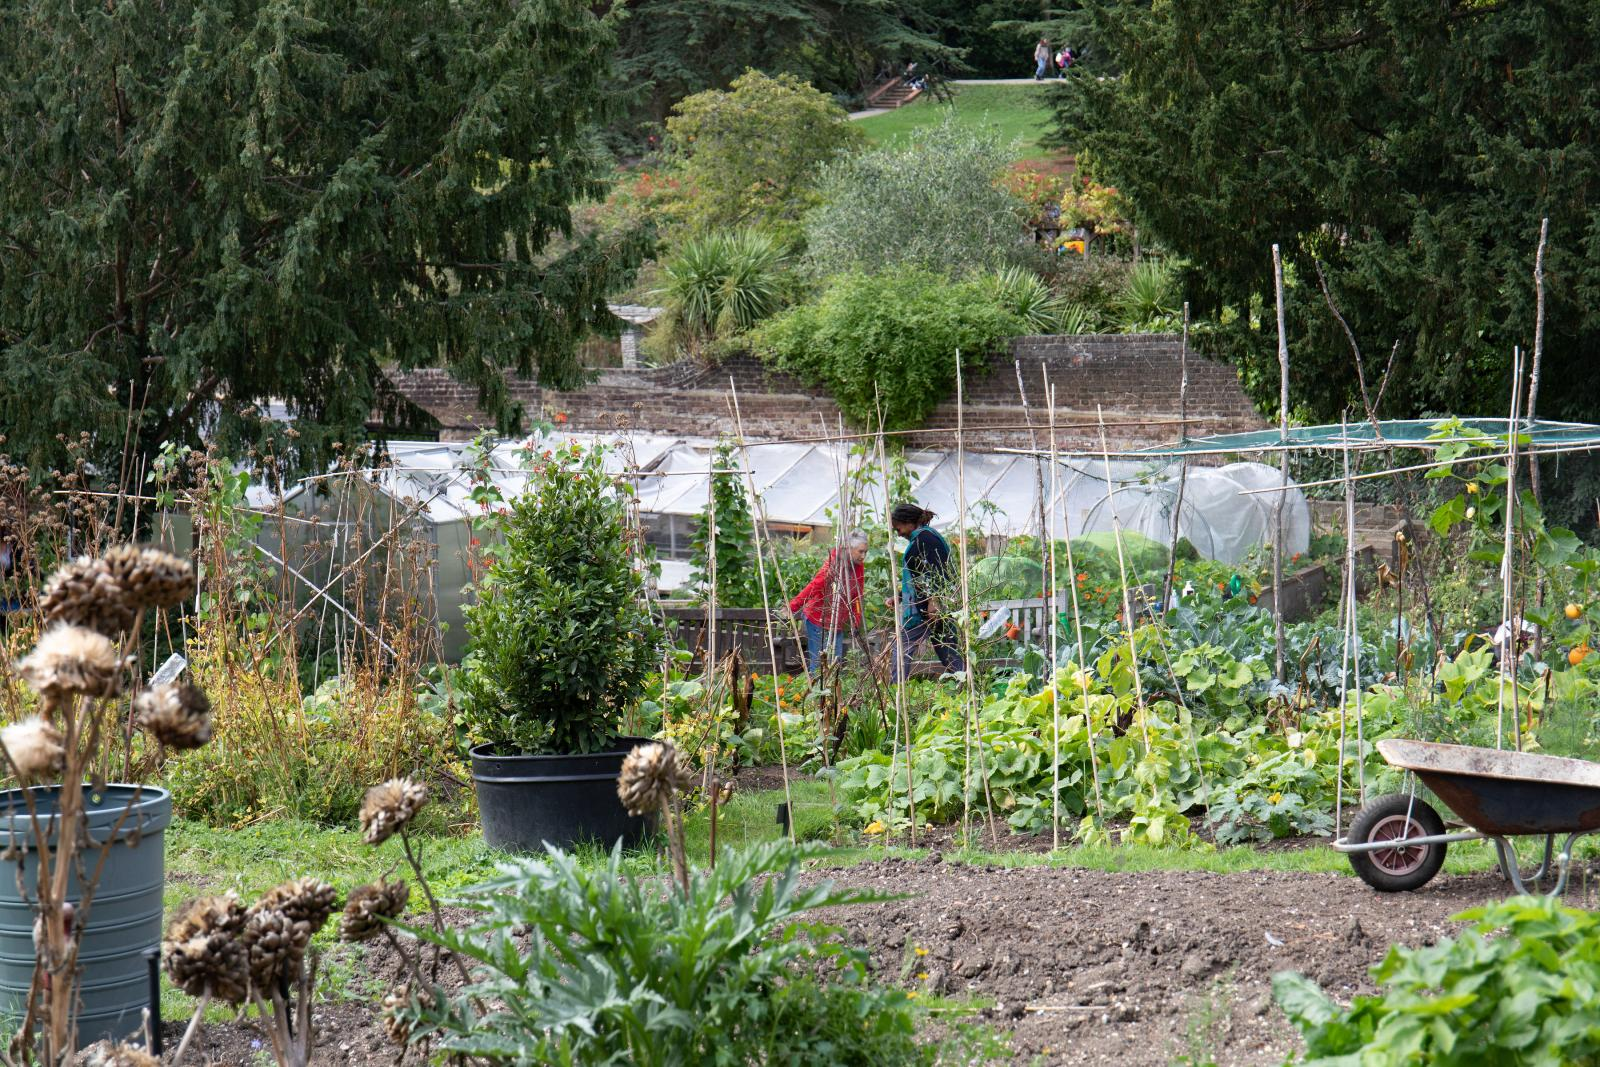 Streatham Community Garden by Zoe WA